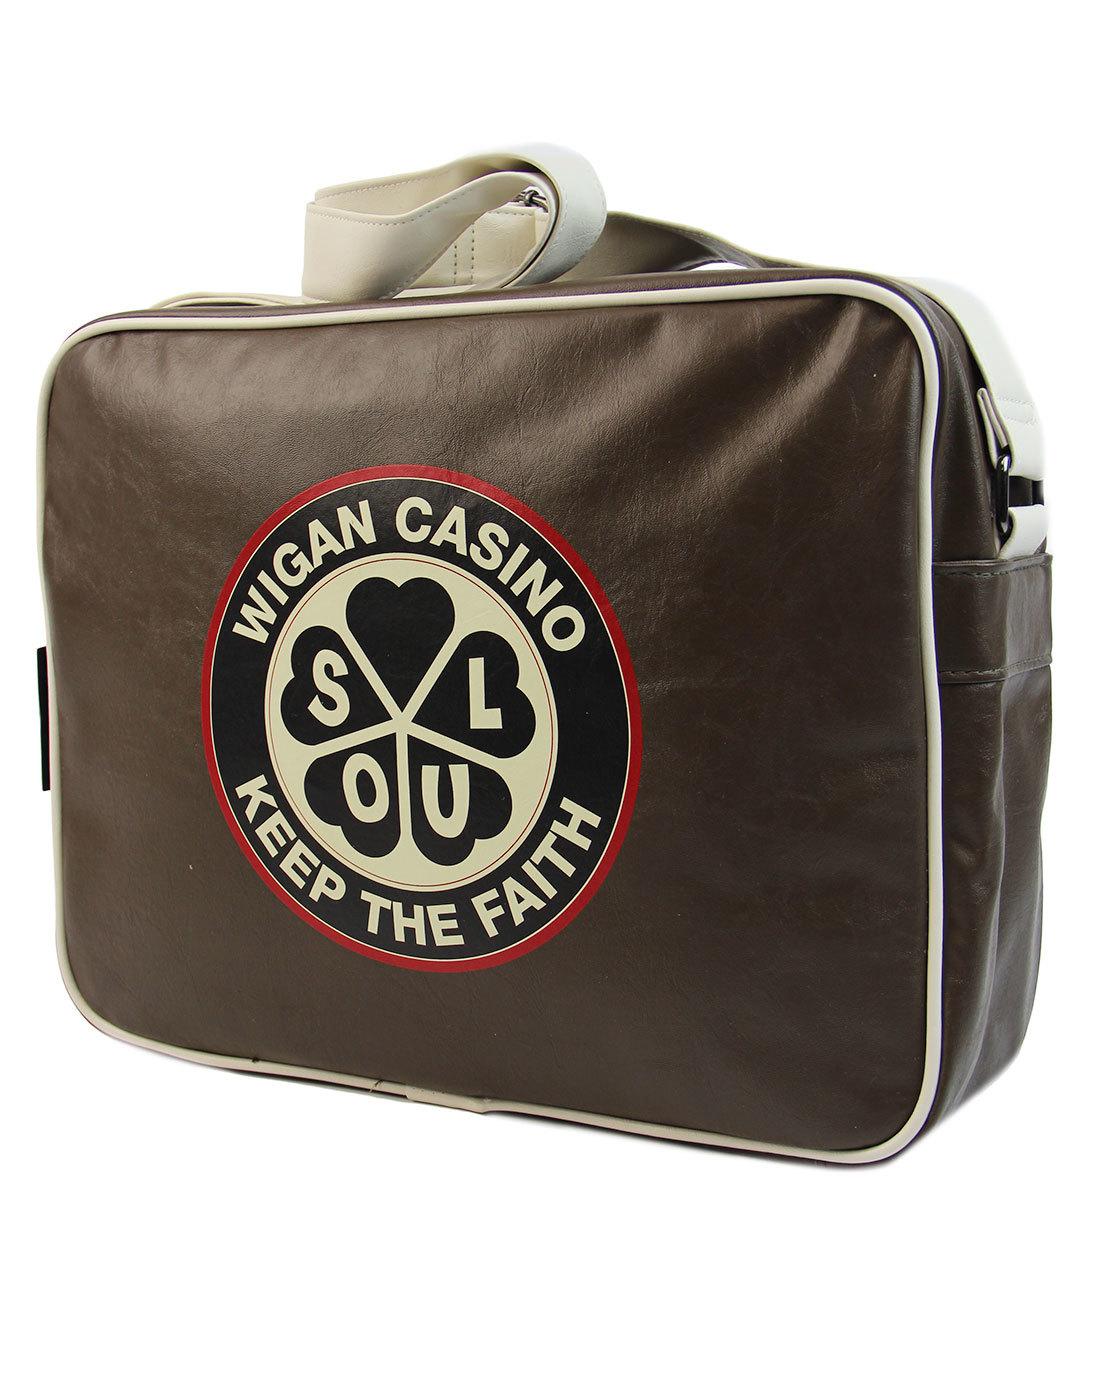 WIGAN CASINO Northern Soul Shoulder Bag BROWN